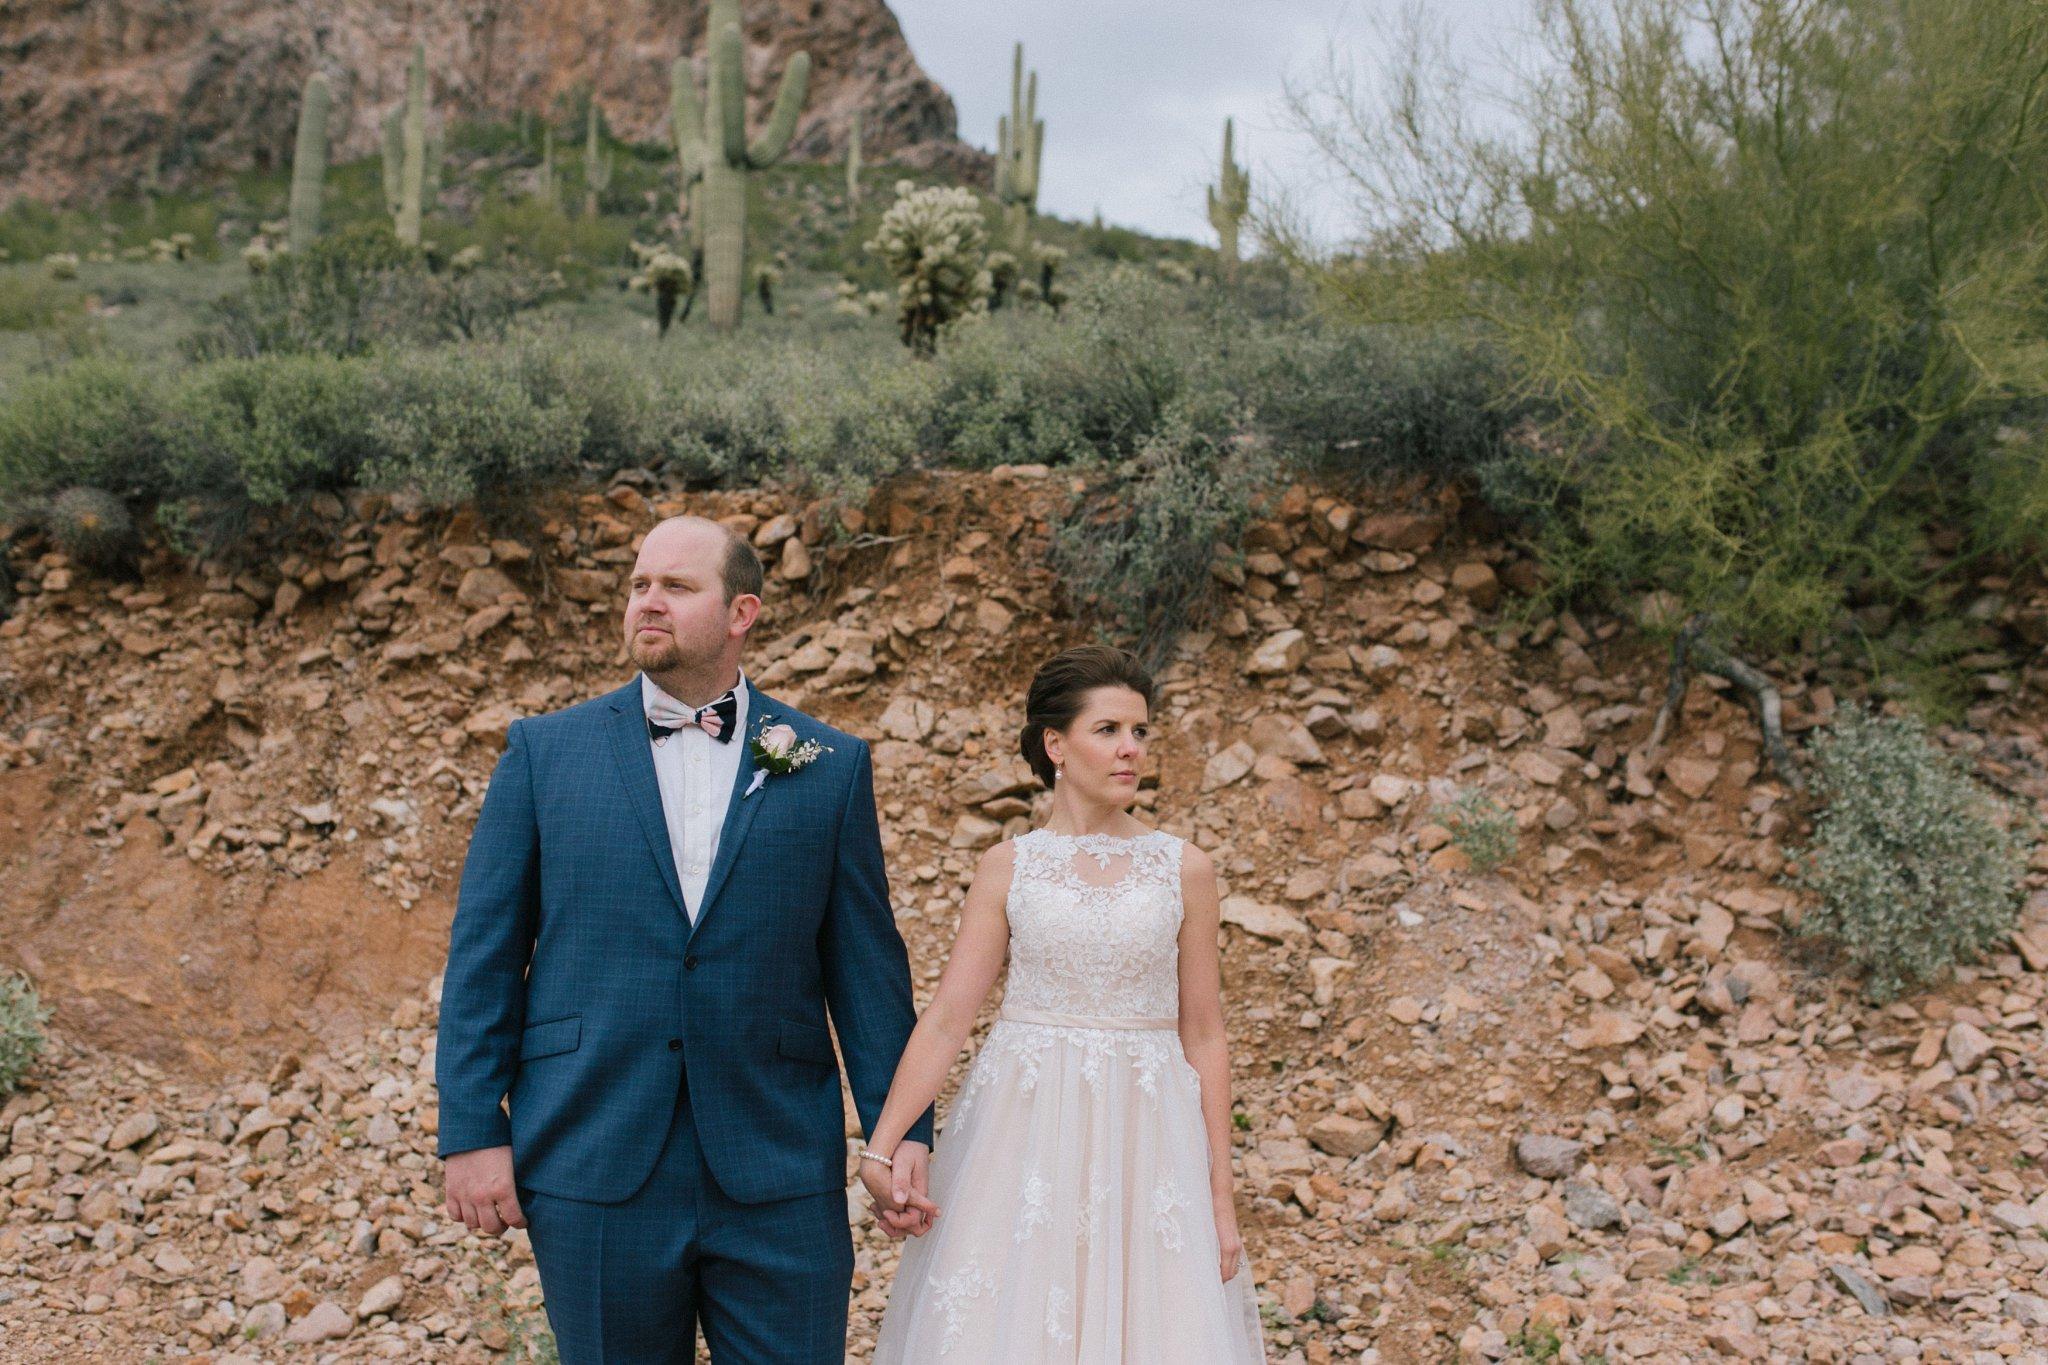 bride & groom in the Arizona desert Gold Canyon